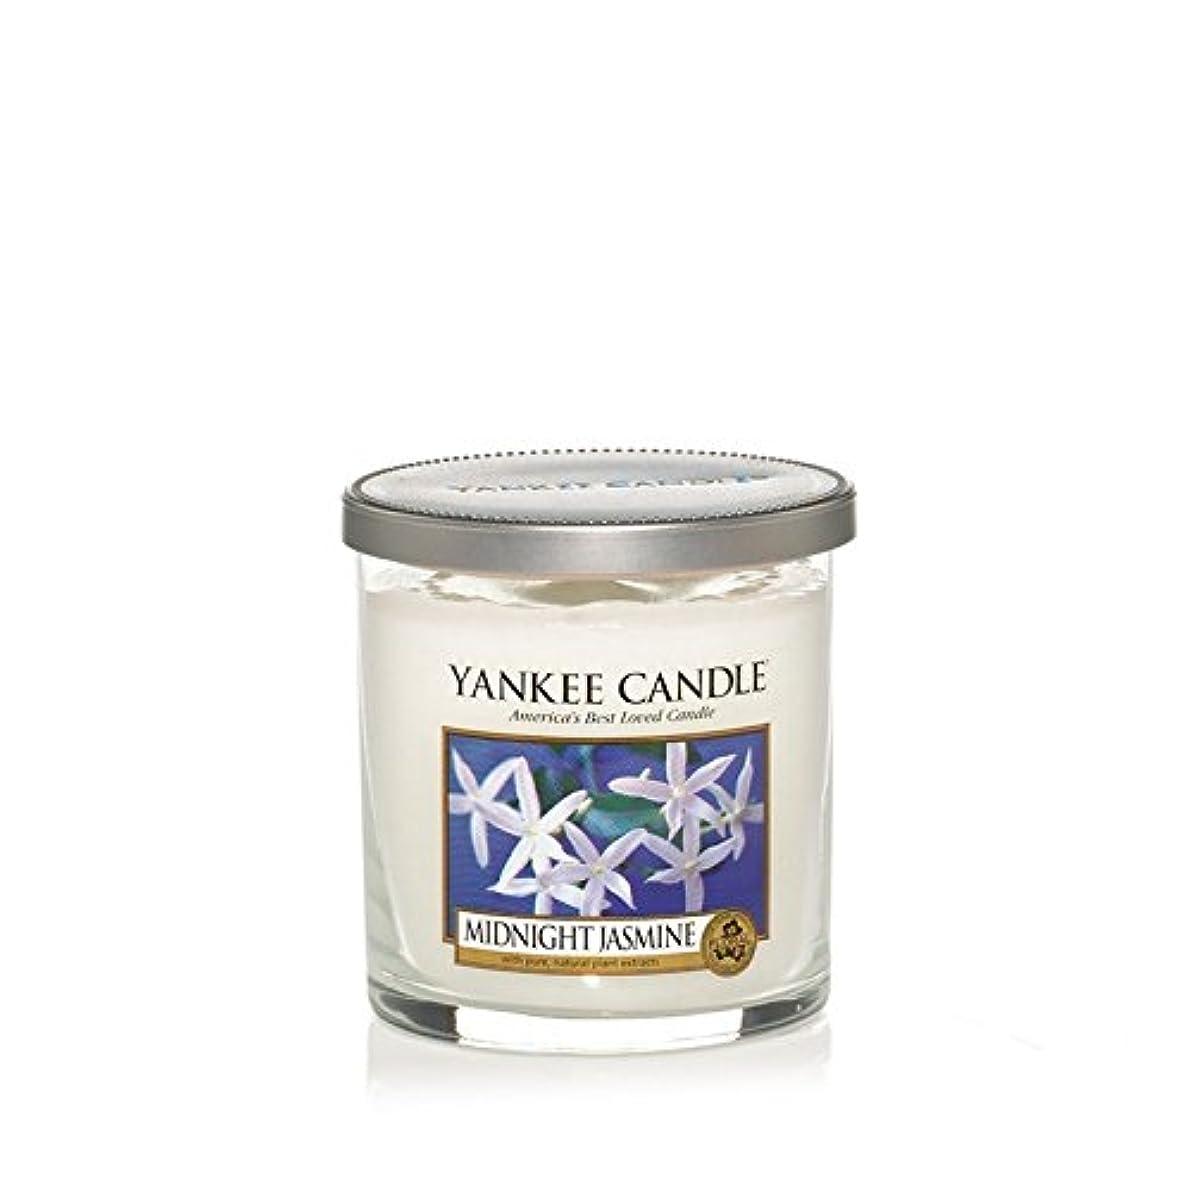 Yankee Candles Small Pillar Candle - Midnight Jasmine (Pack of 6) - ヤンキーキャンドルの小さな柱キャンドル - 深夜ジャスミン (x6) [並行輸入品]